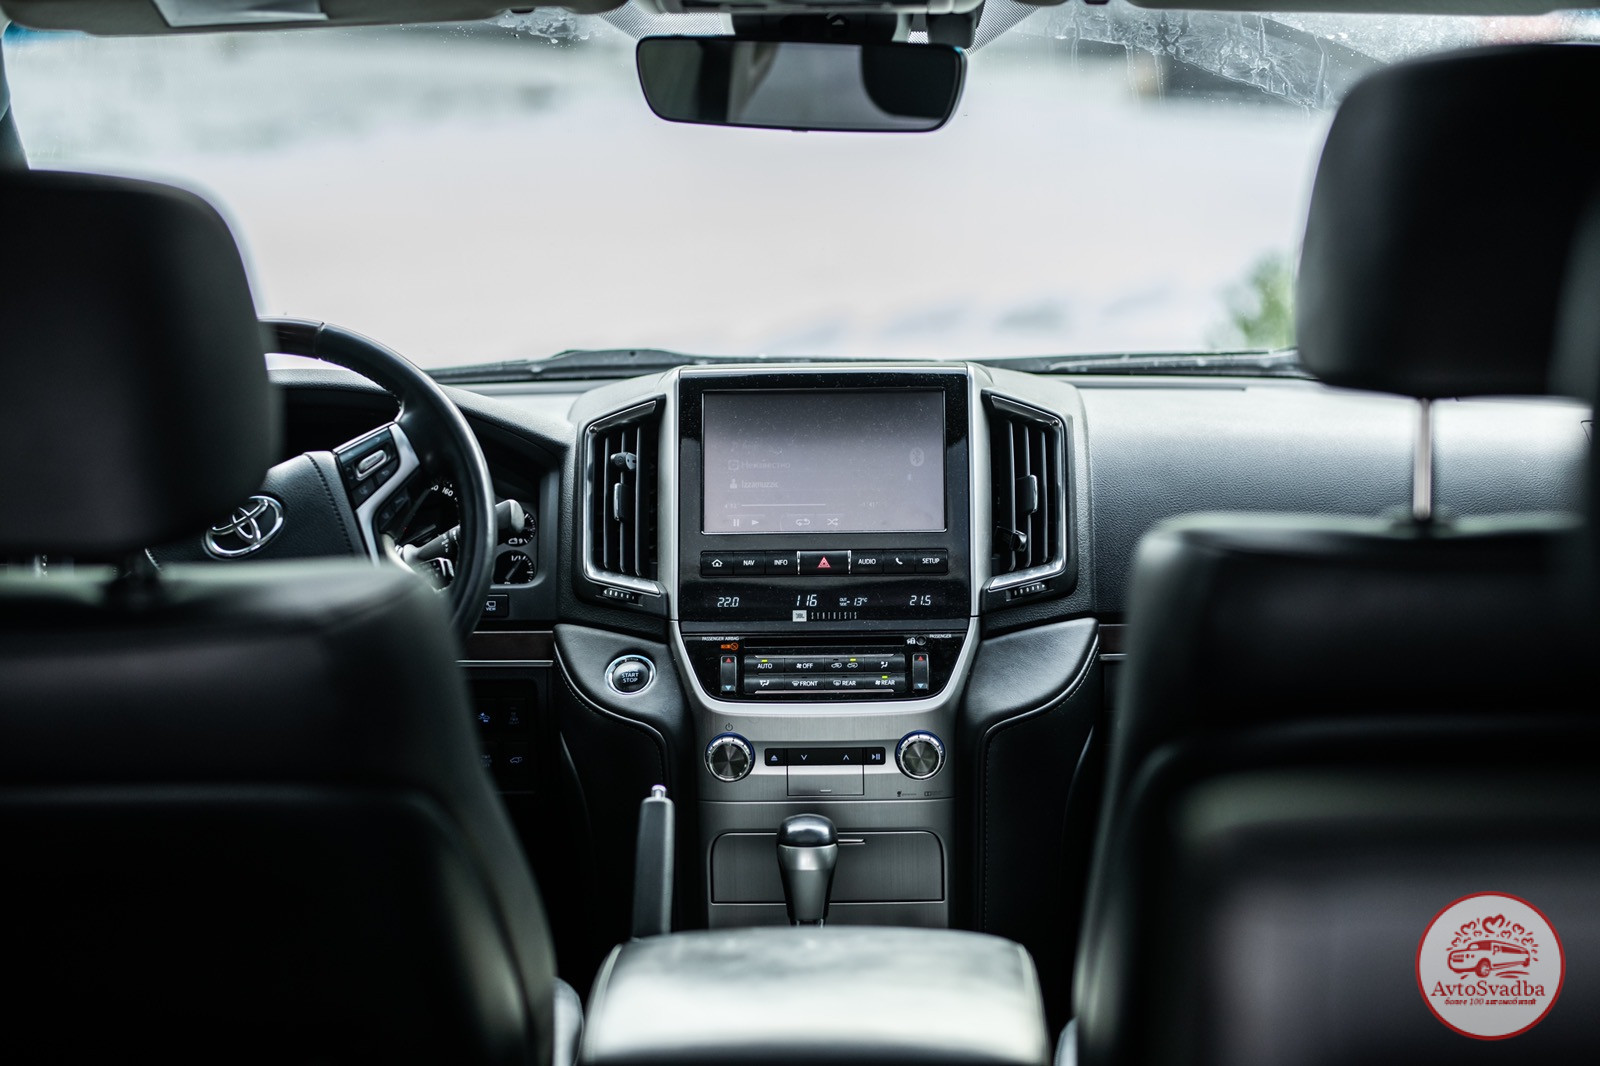 Салон джипа Toyota Land Cruiser 200